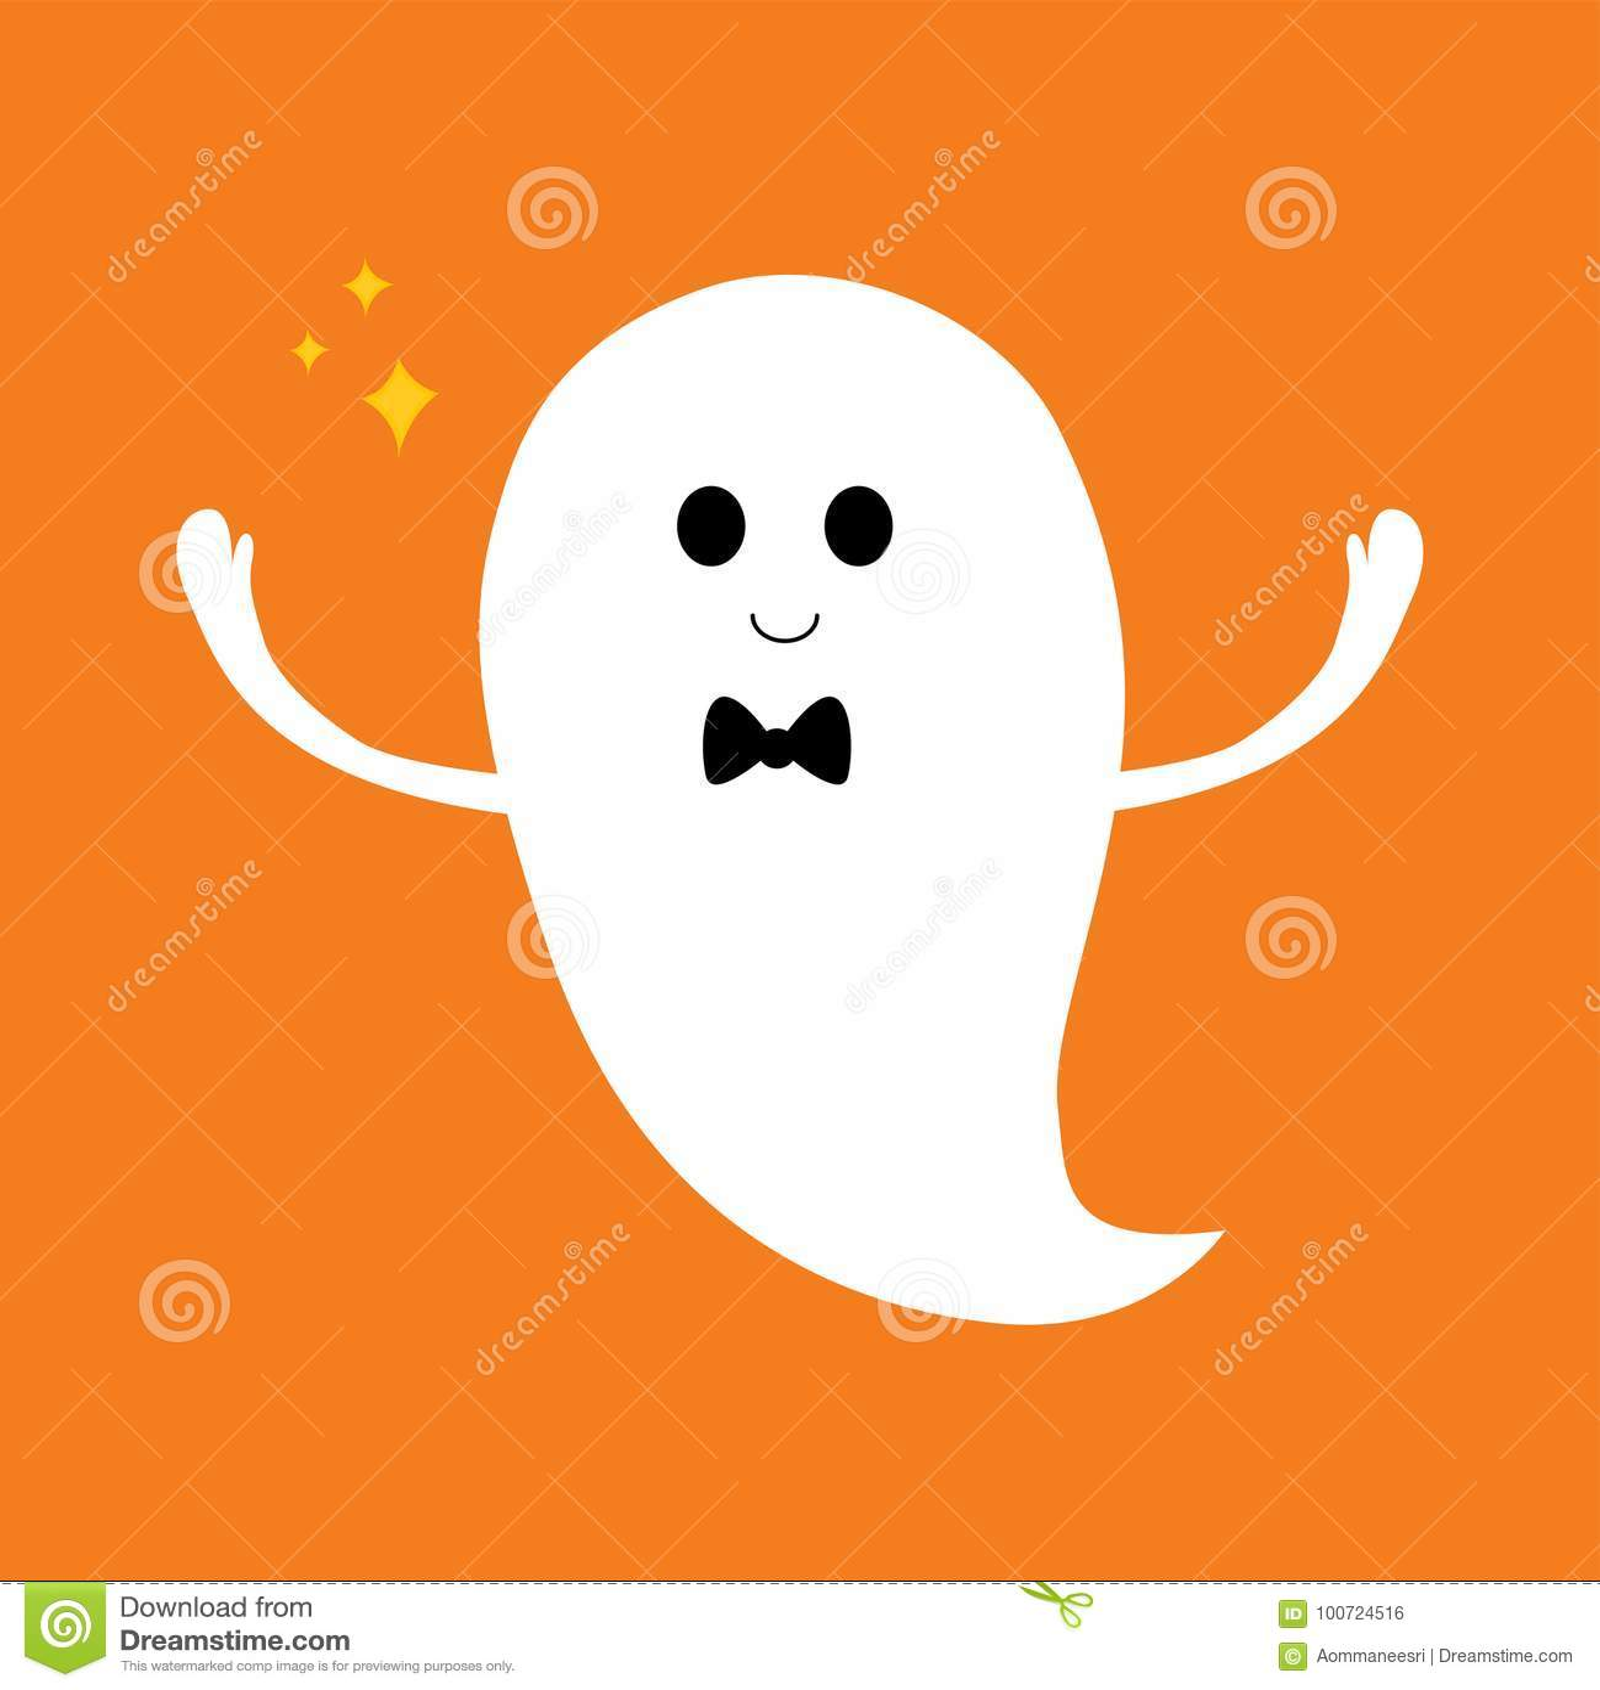 Halloween Ghost Cute Cartoon Stock Images - Download 277 ...